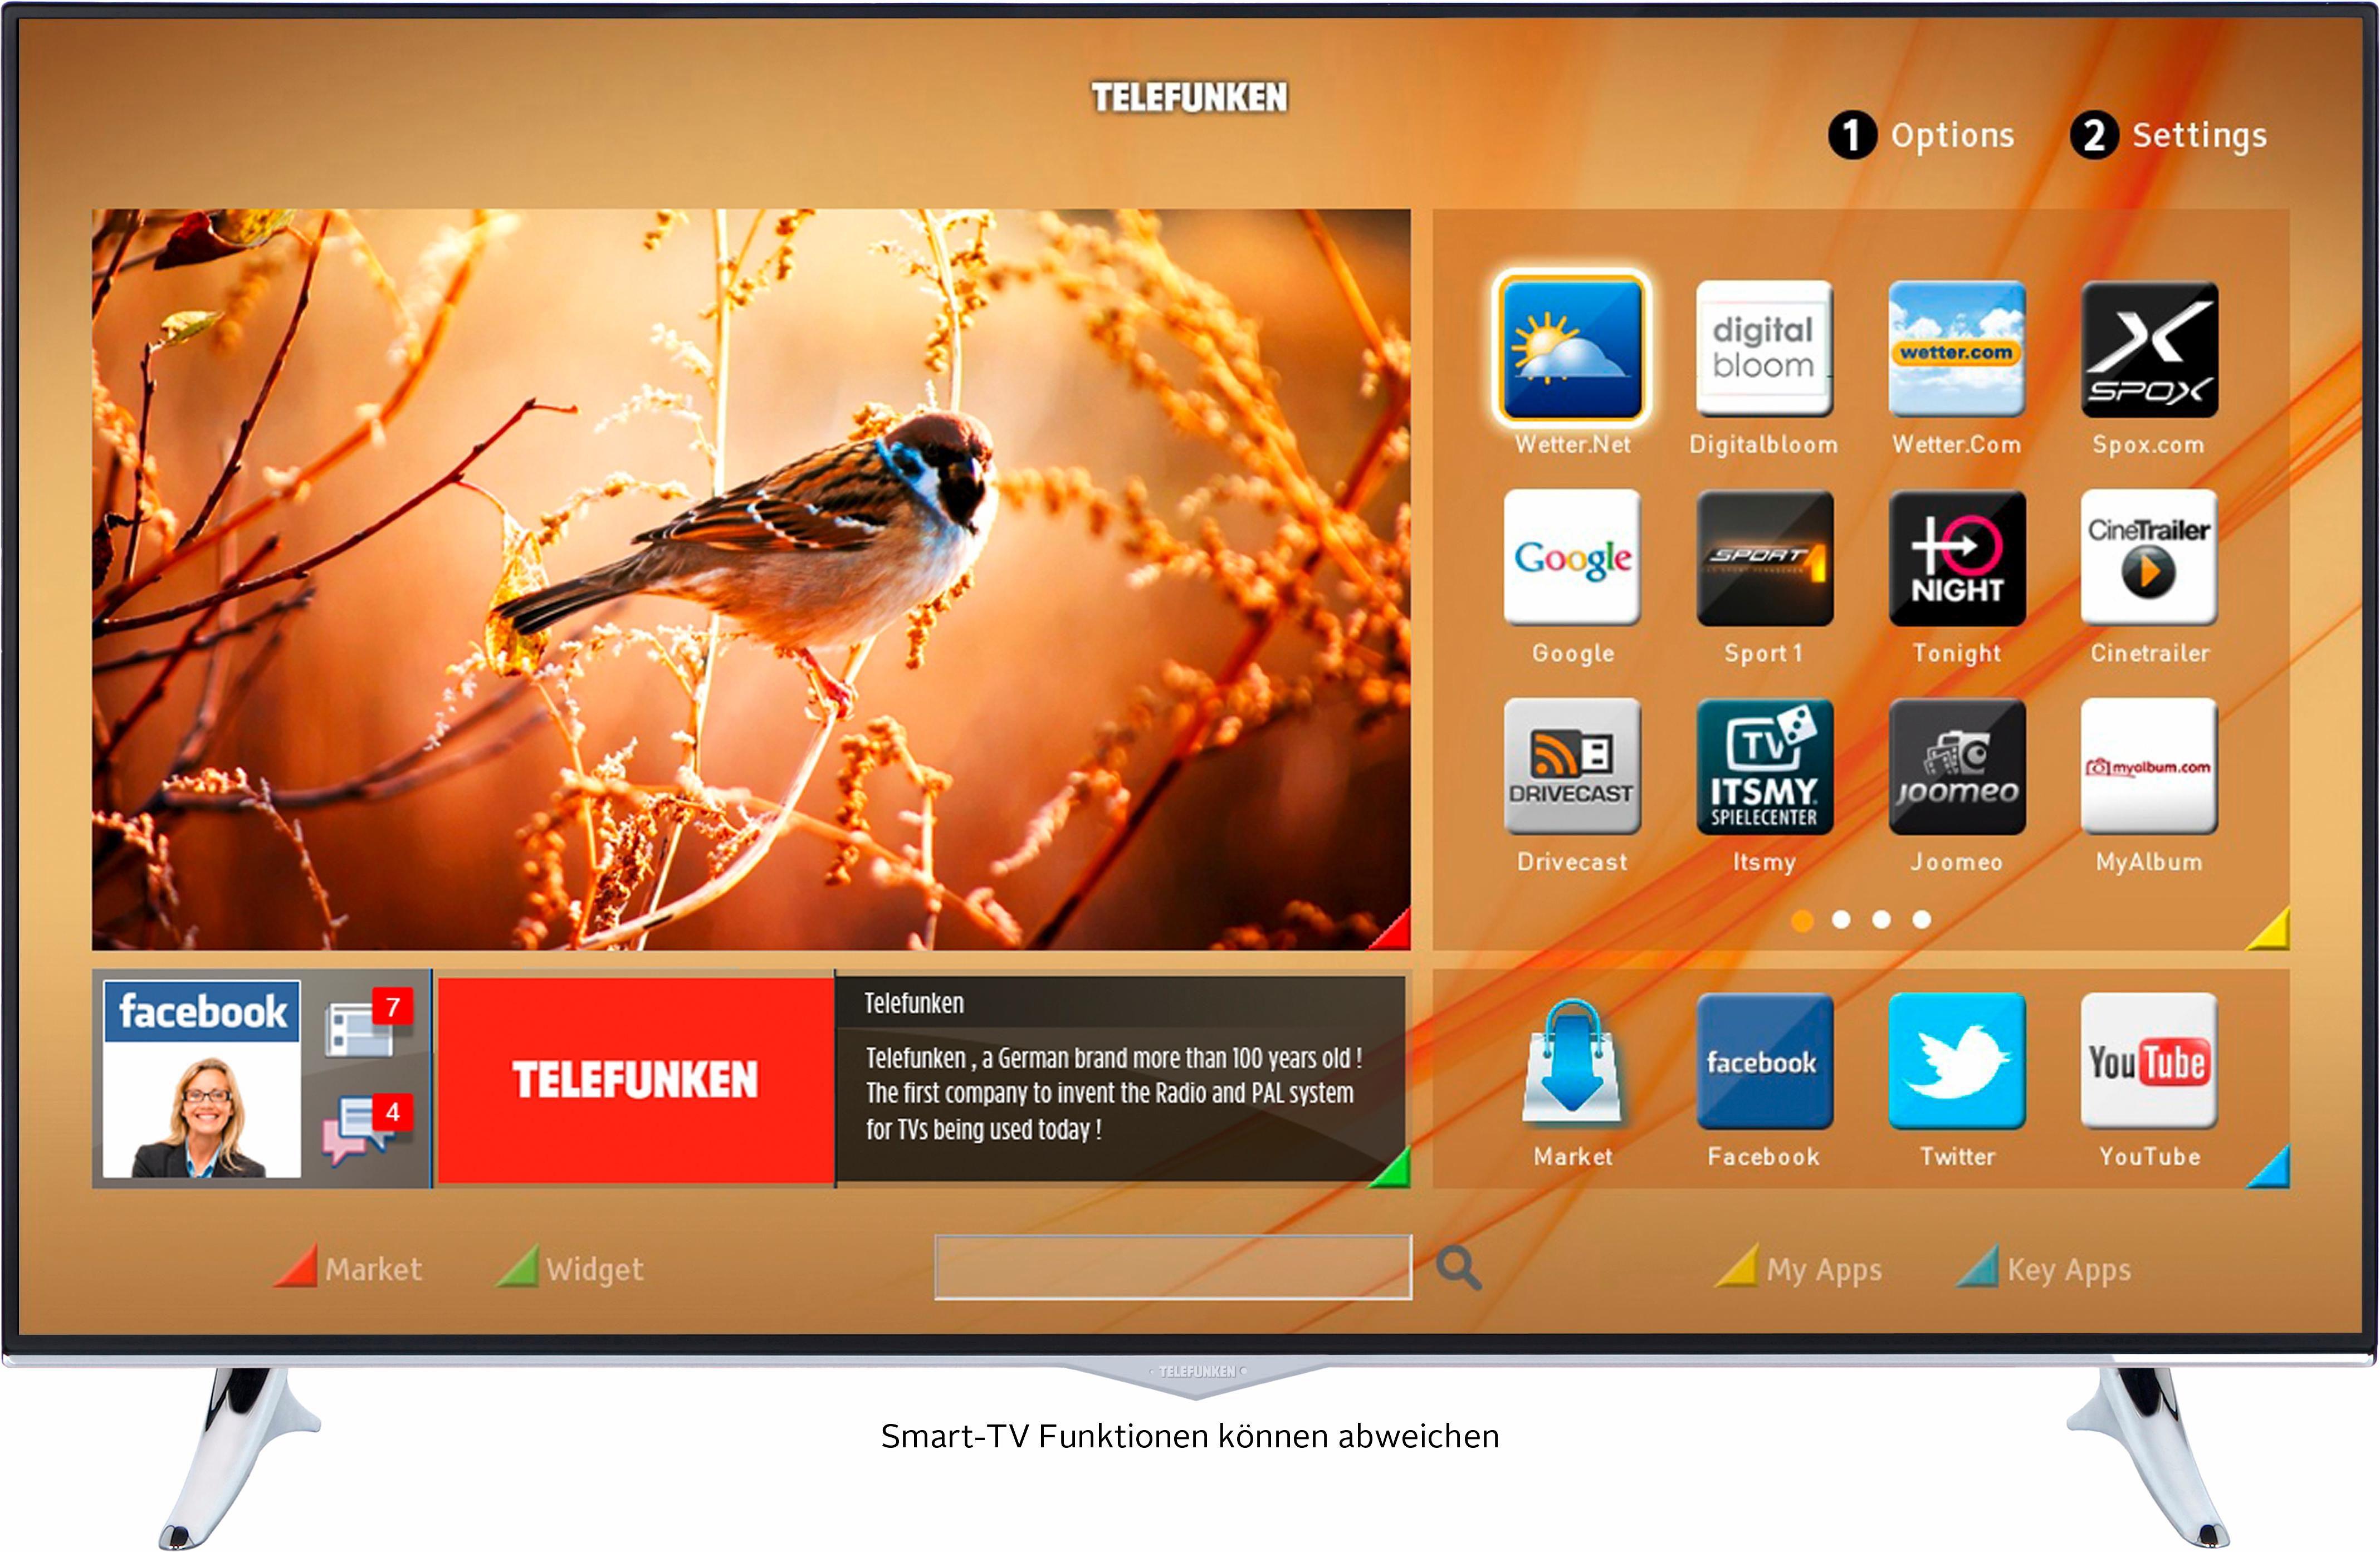 Telefunken L48U300M4CW, LED Fernseher, 122 cm (48 Zoll), 2160p (4K Ultra HD), Smart-TV